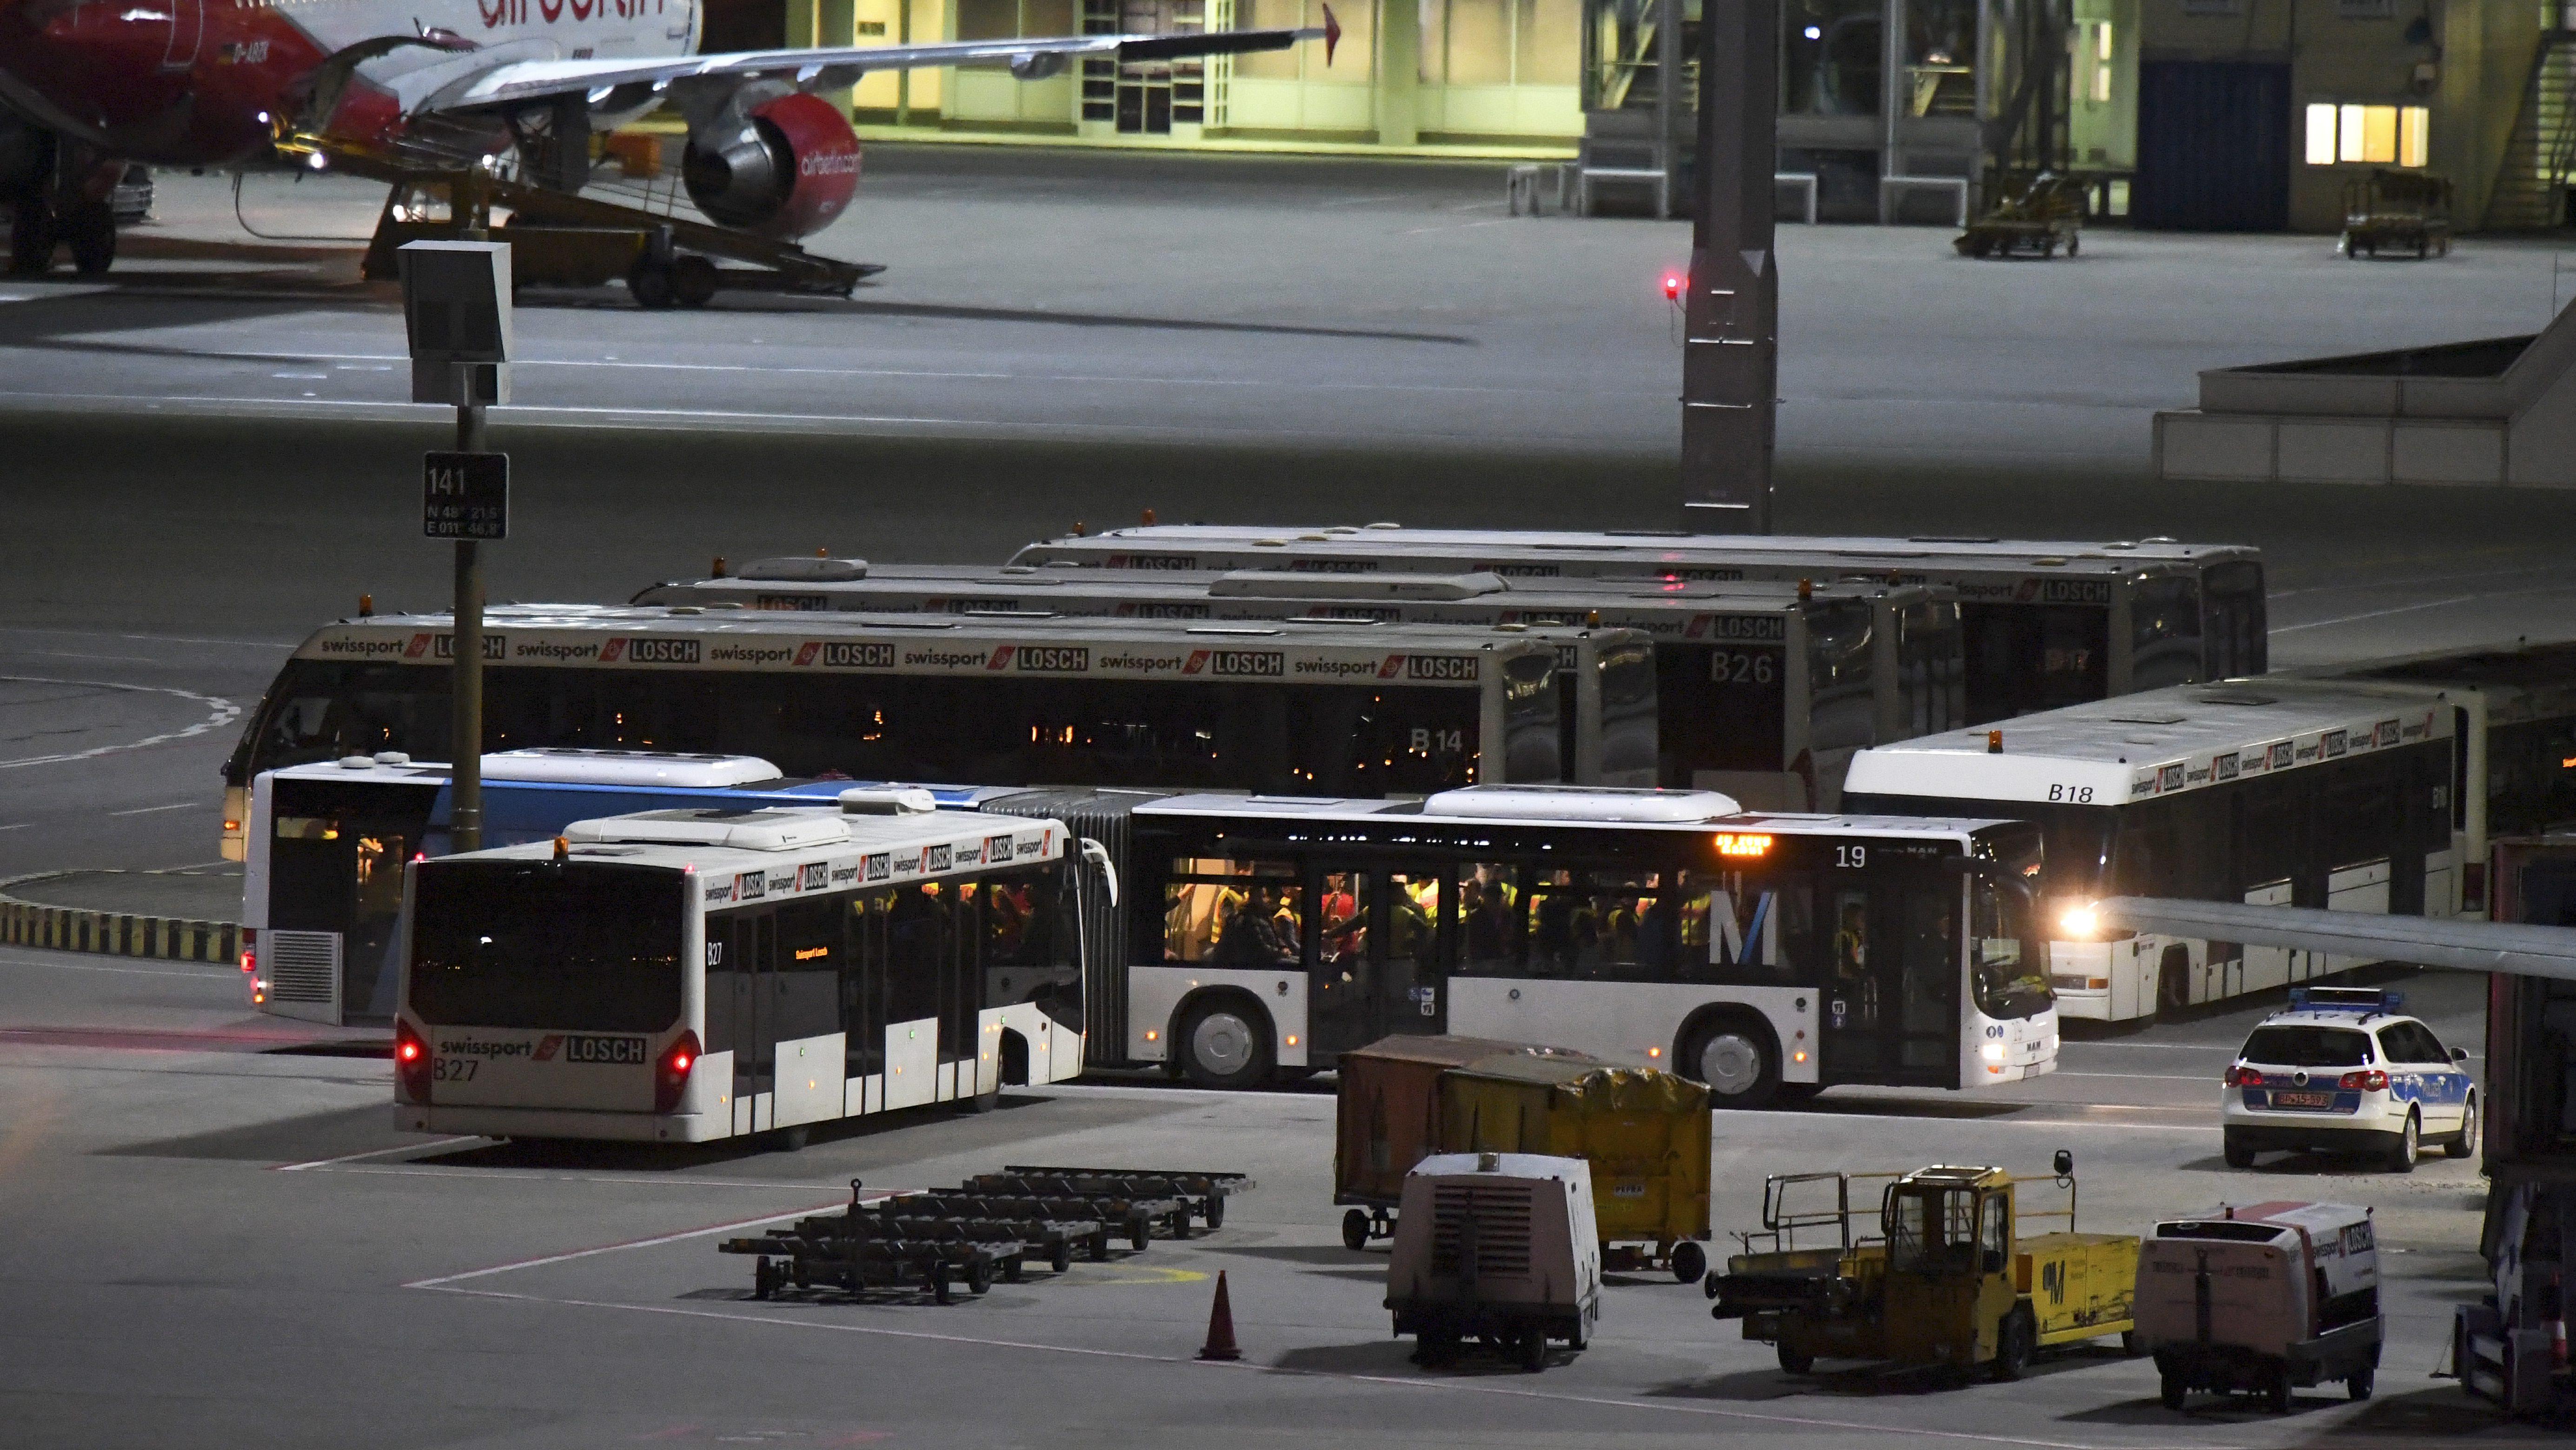 Pilots ground 222 flights after refusing to deport asylum